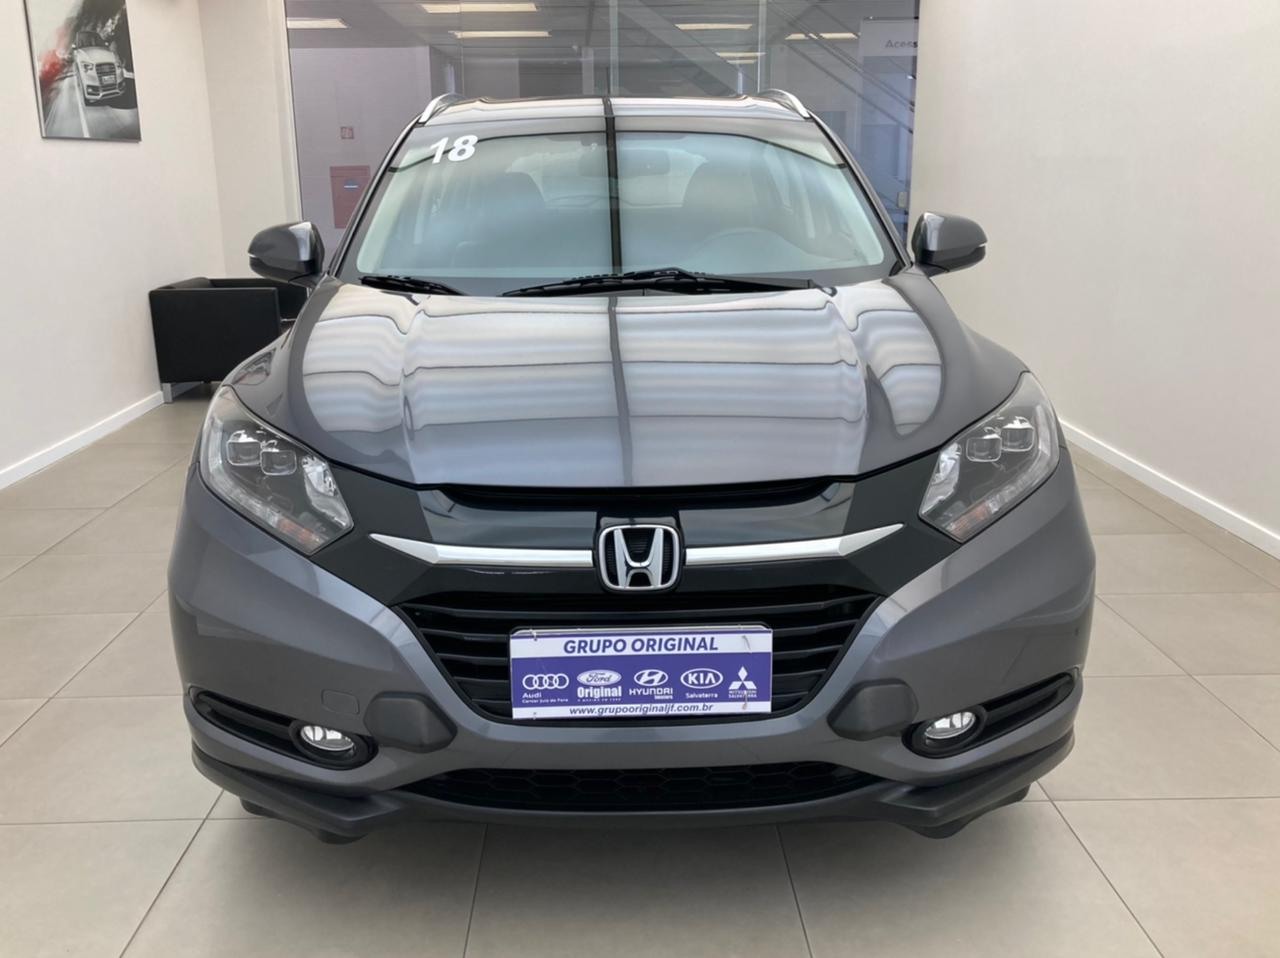 Honda-HR-V-HR-V Touring 1.8 Flexone 16V 5p Aut.